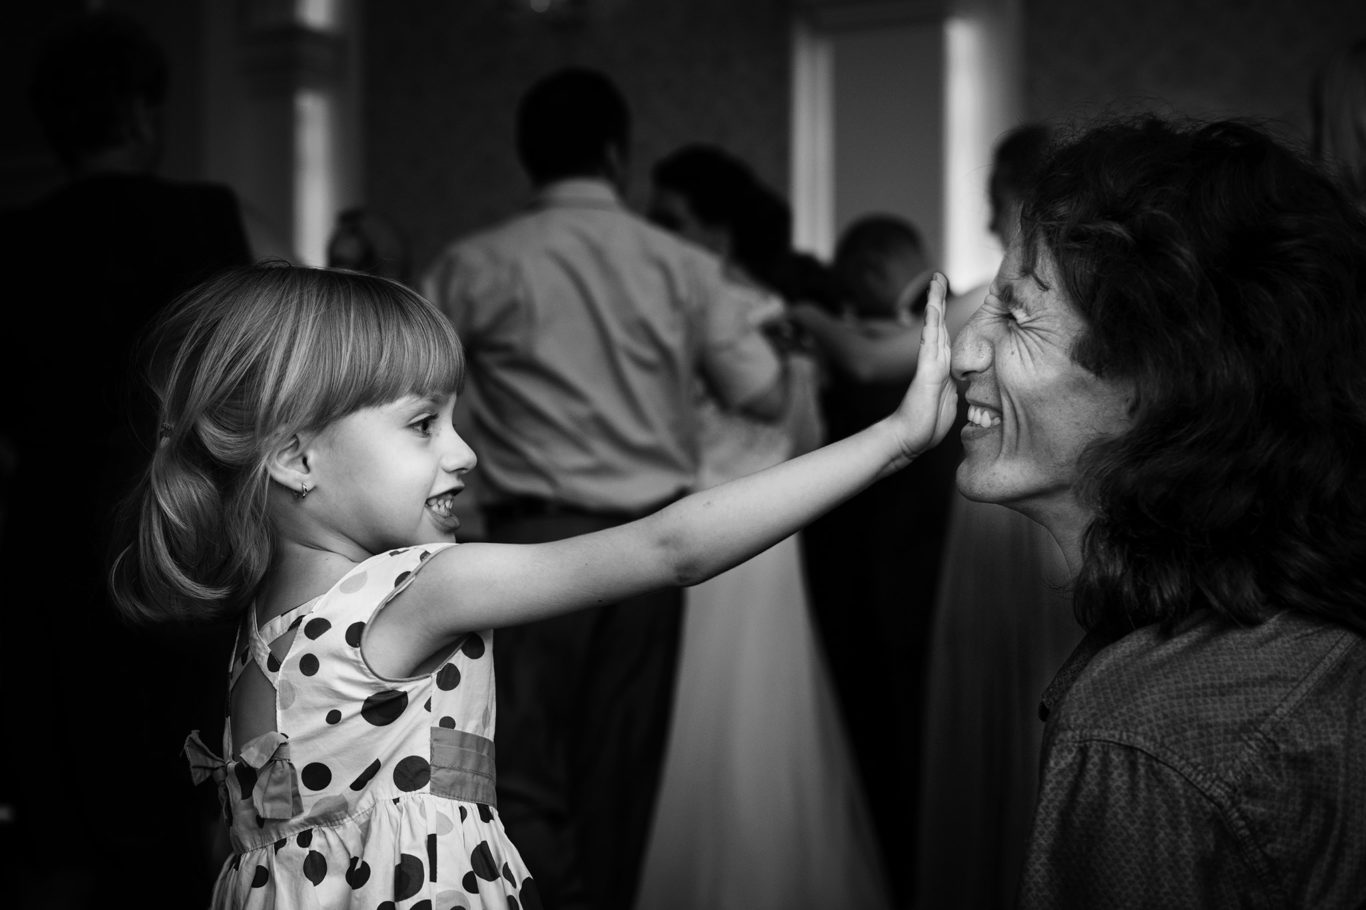 0671-fotografie-nunta-bucuresti-anca-george-fotograf-ciprian-dumitrescu-dsc_9478